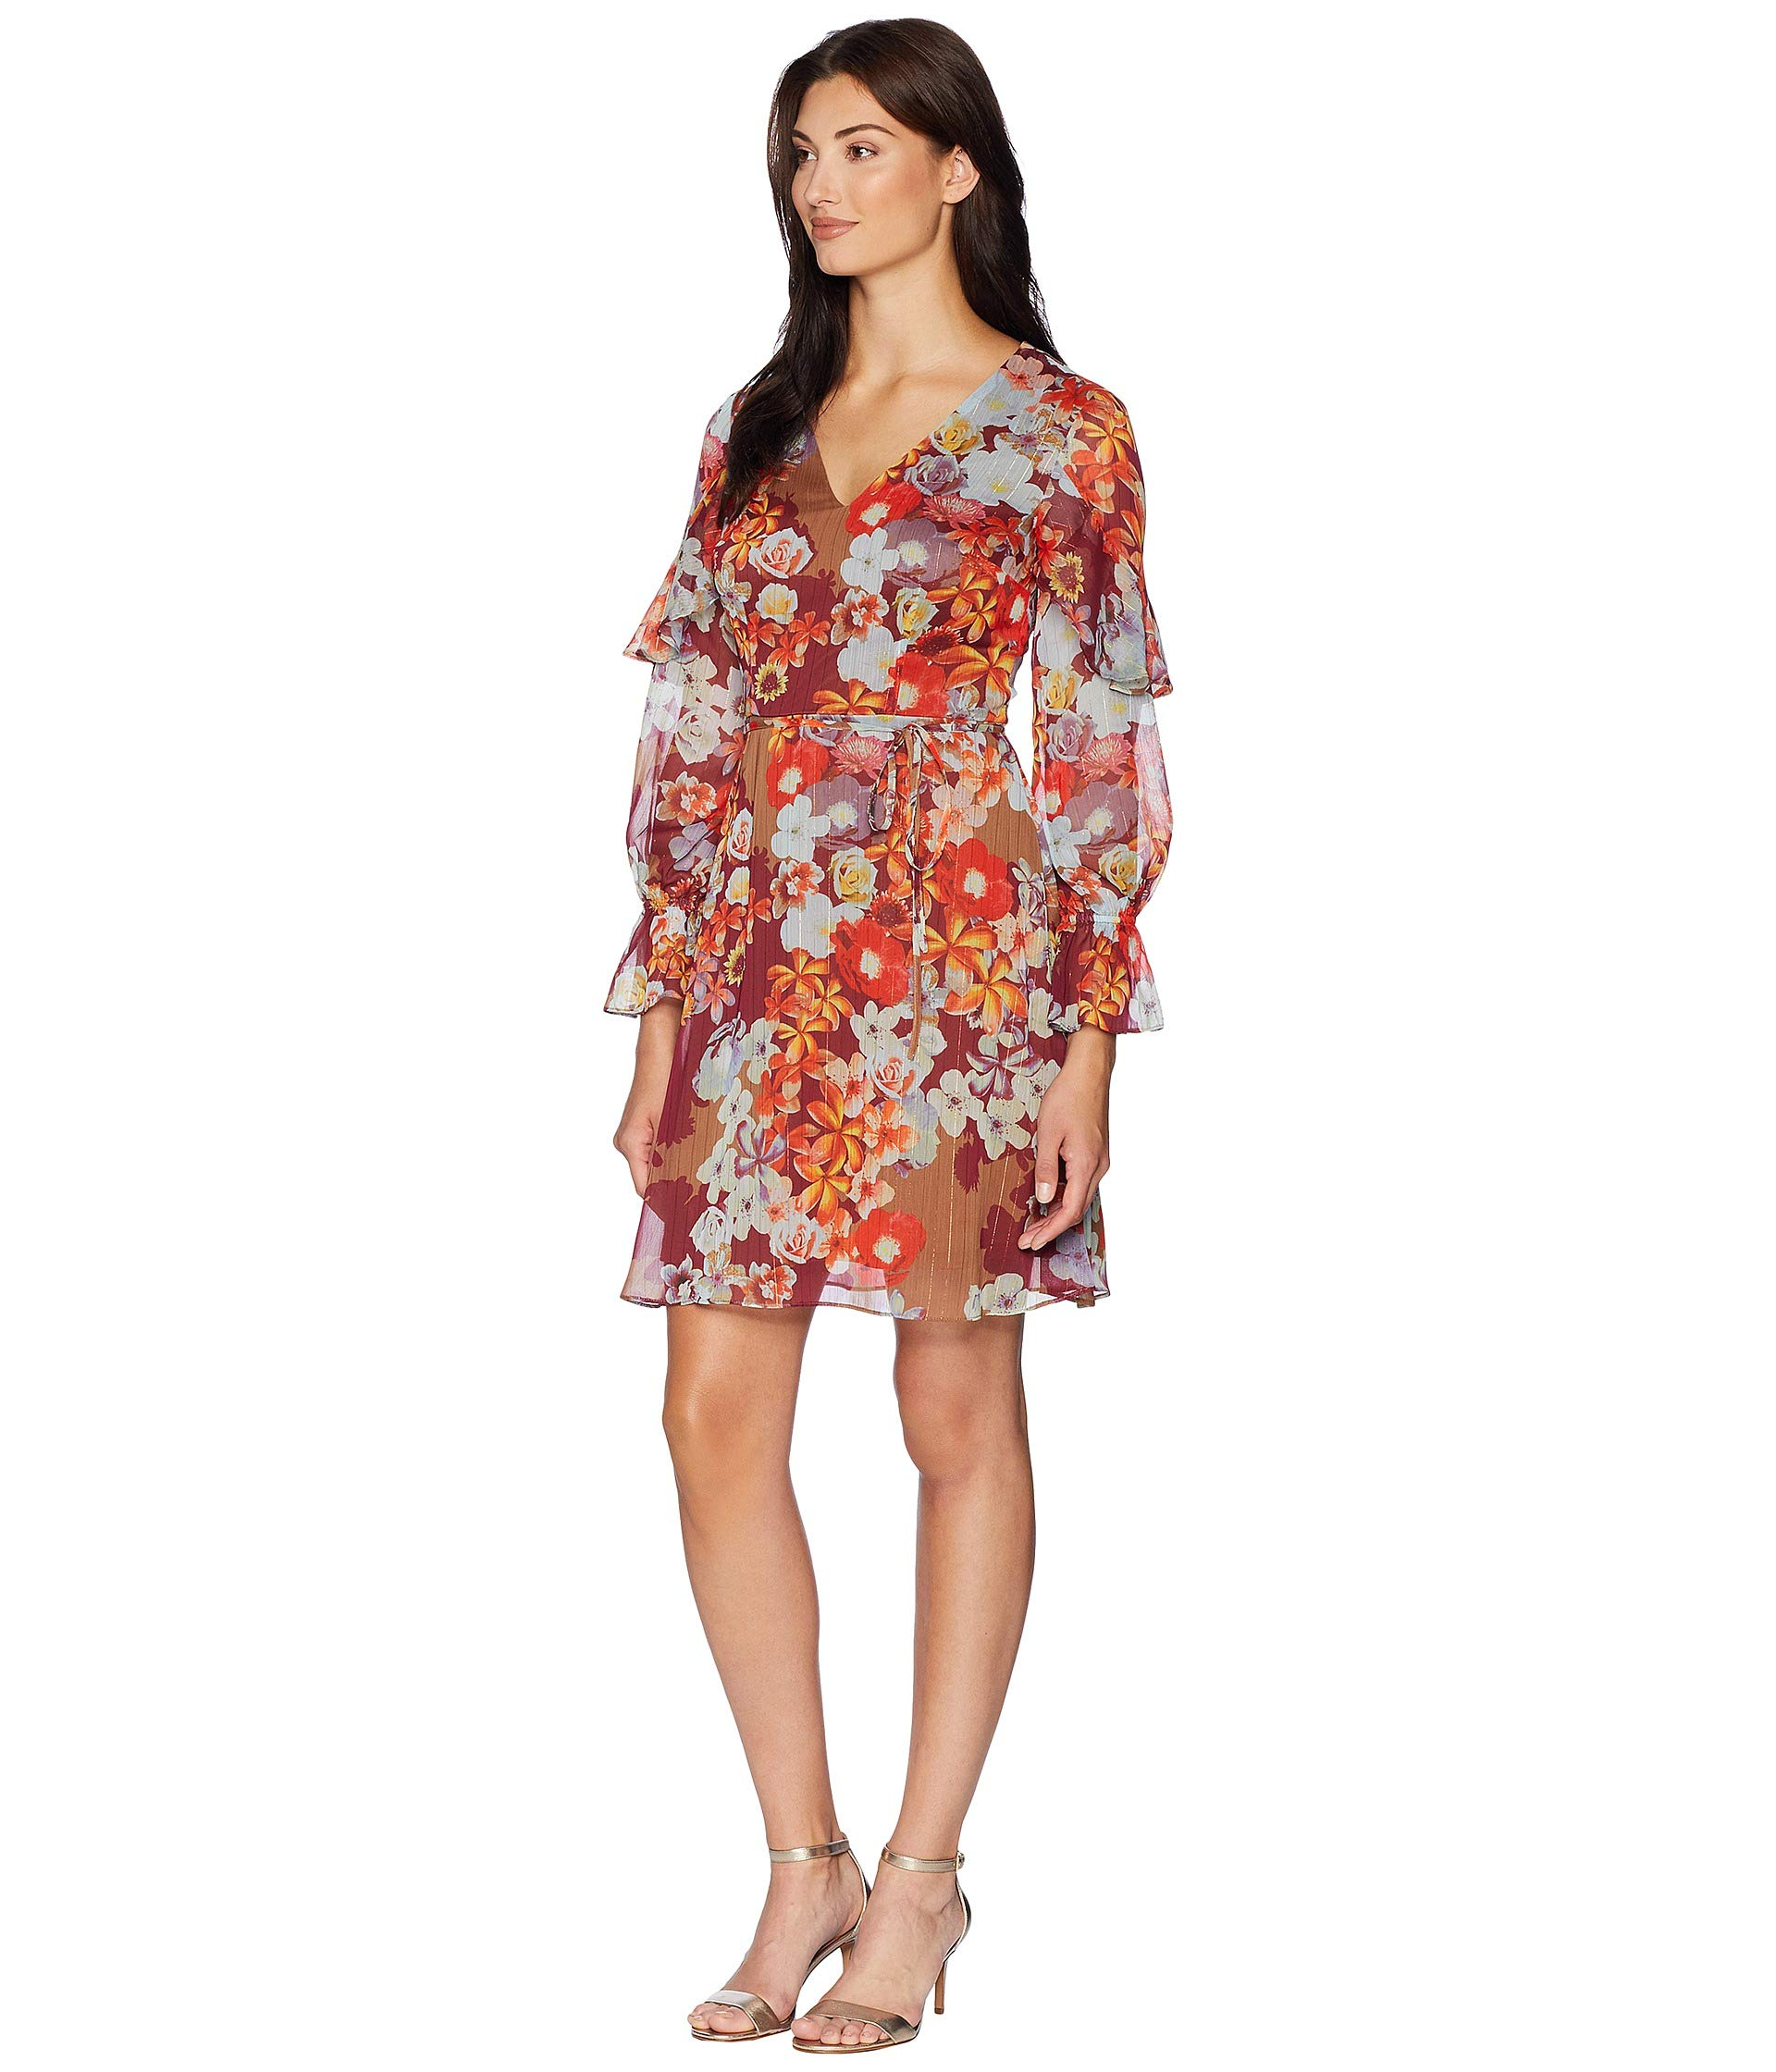 Ruffle Sleeve Dress Stripe Chiffon Metallic Papell Floral Adrianna Print Burgundy Multi nFwqY0B8H